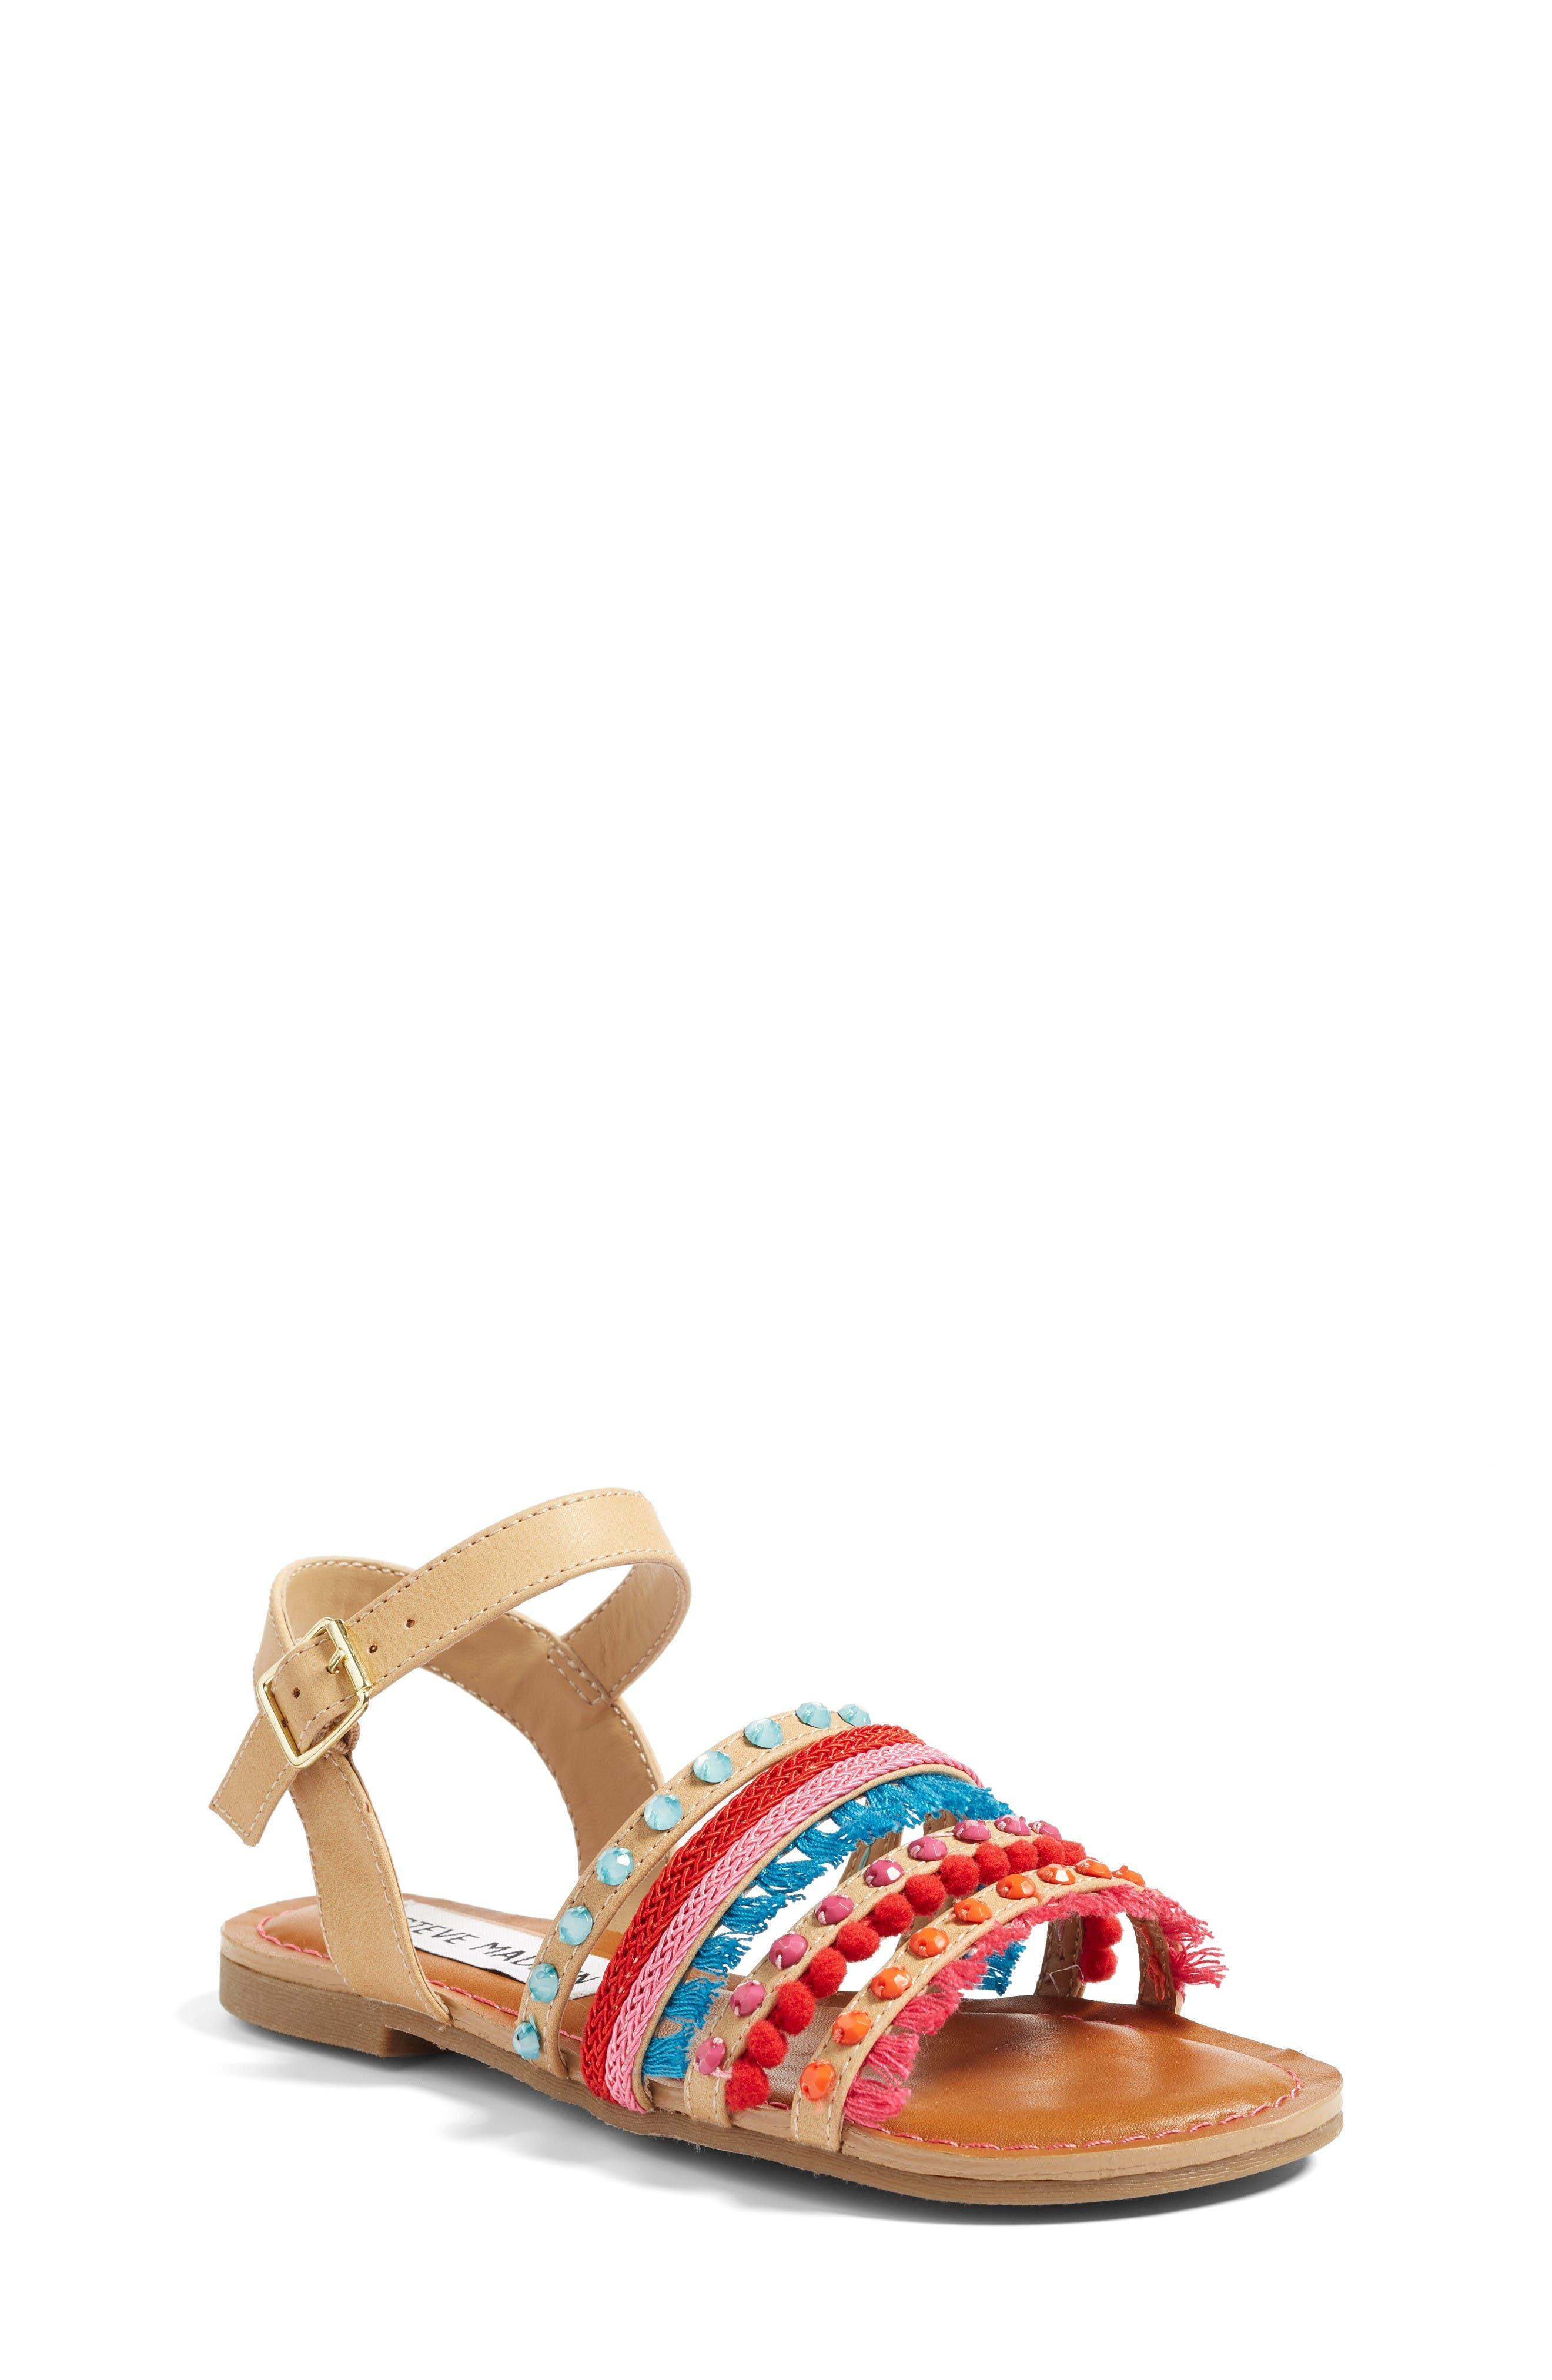 STEVE MADDEN Gypsy Sandal